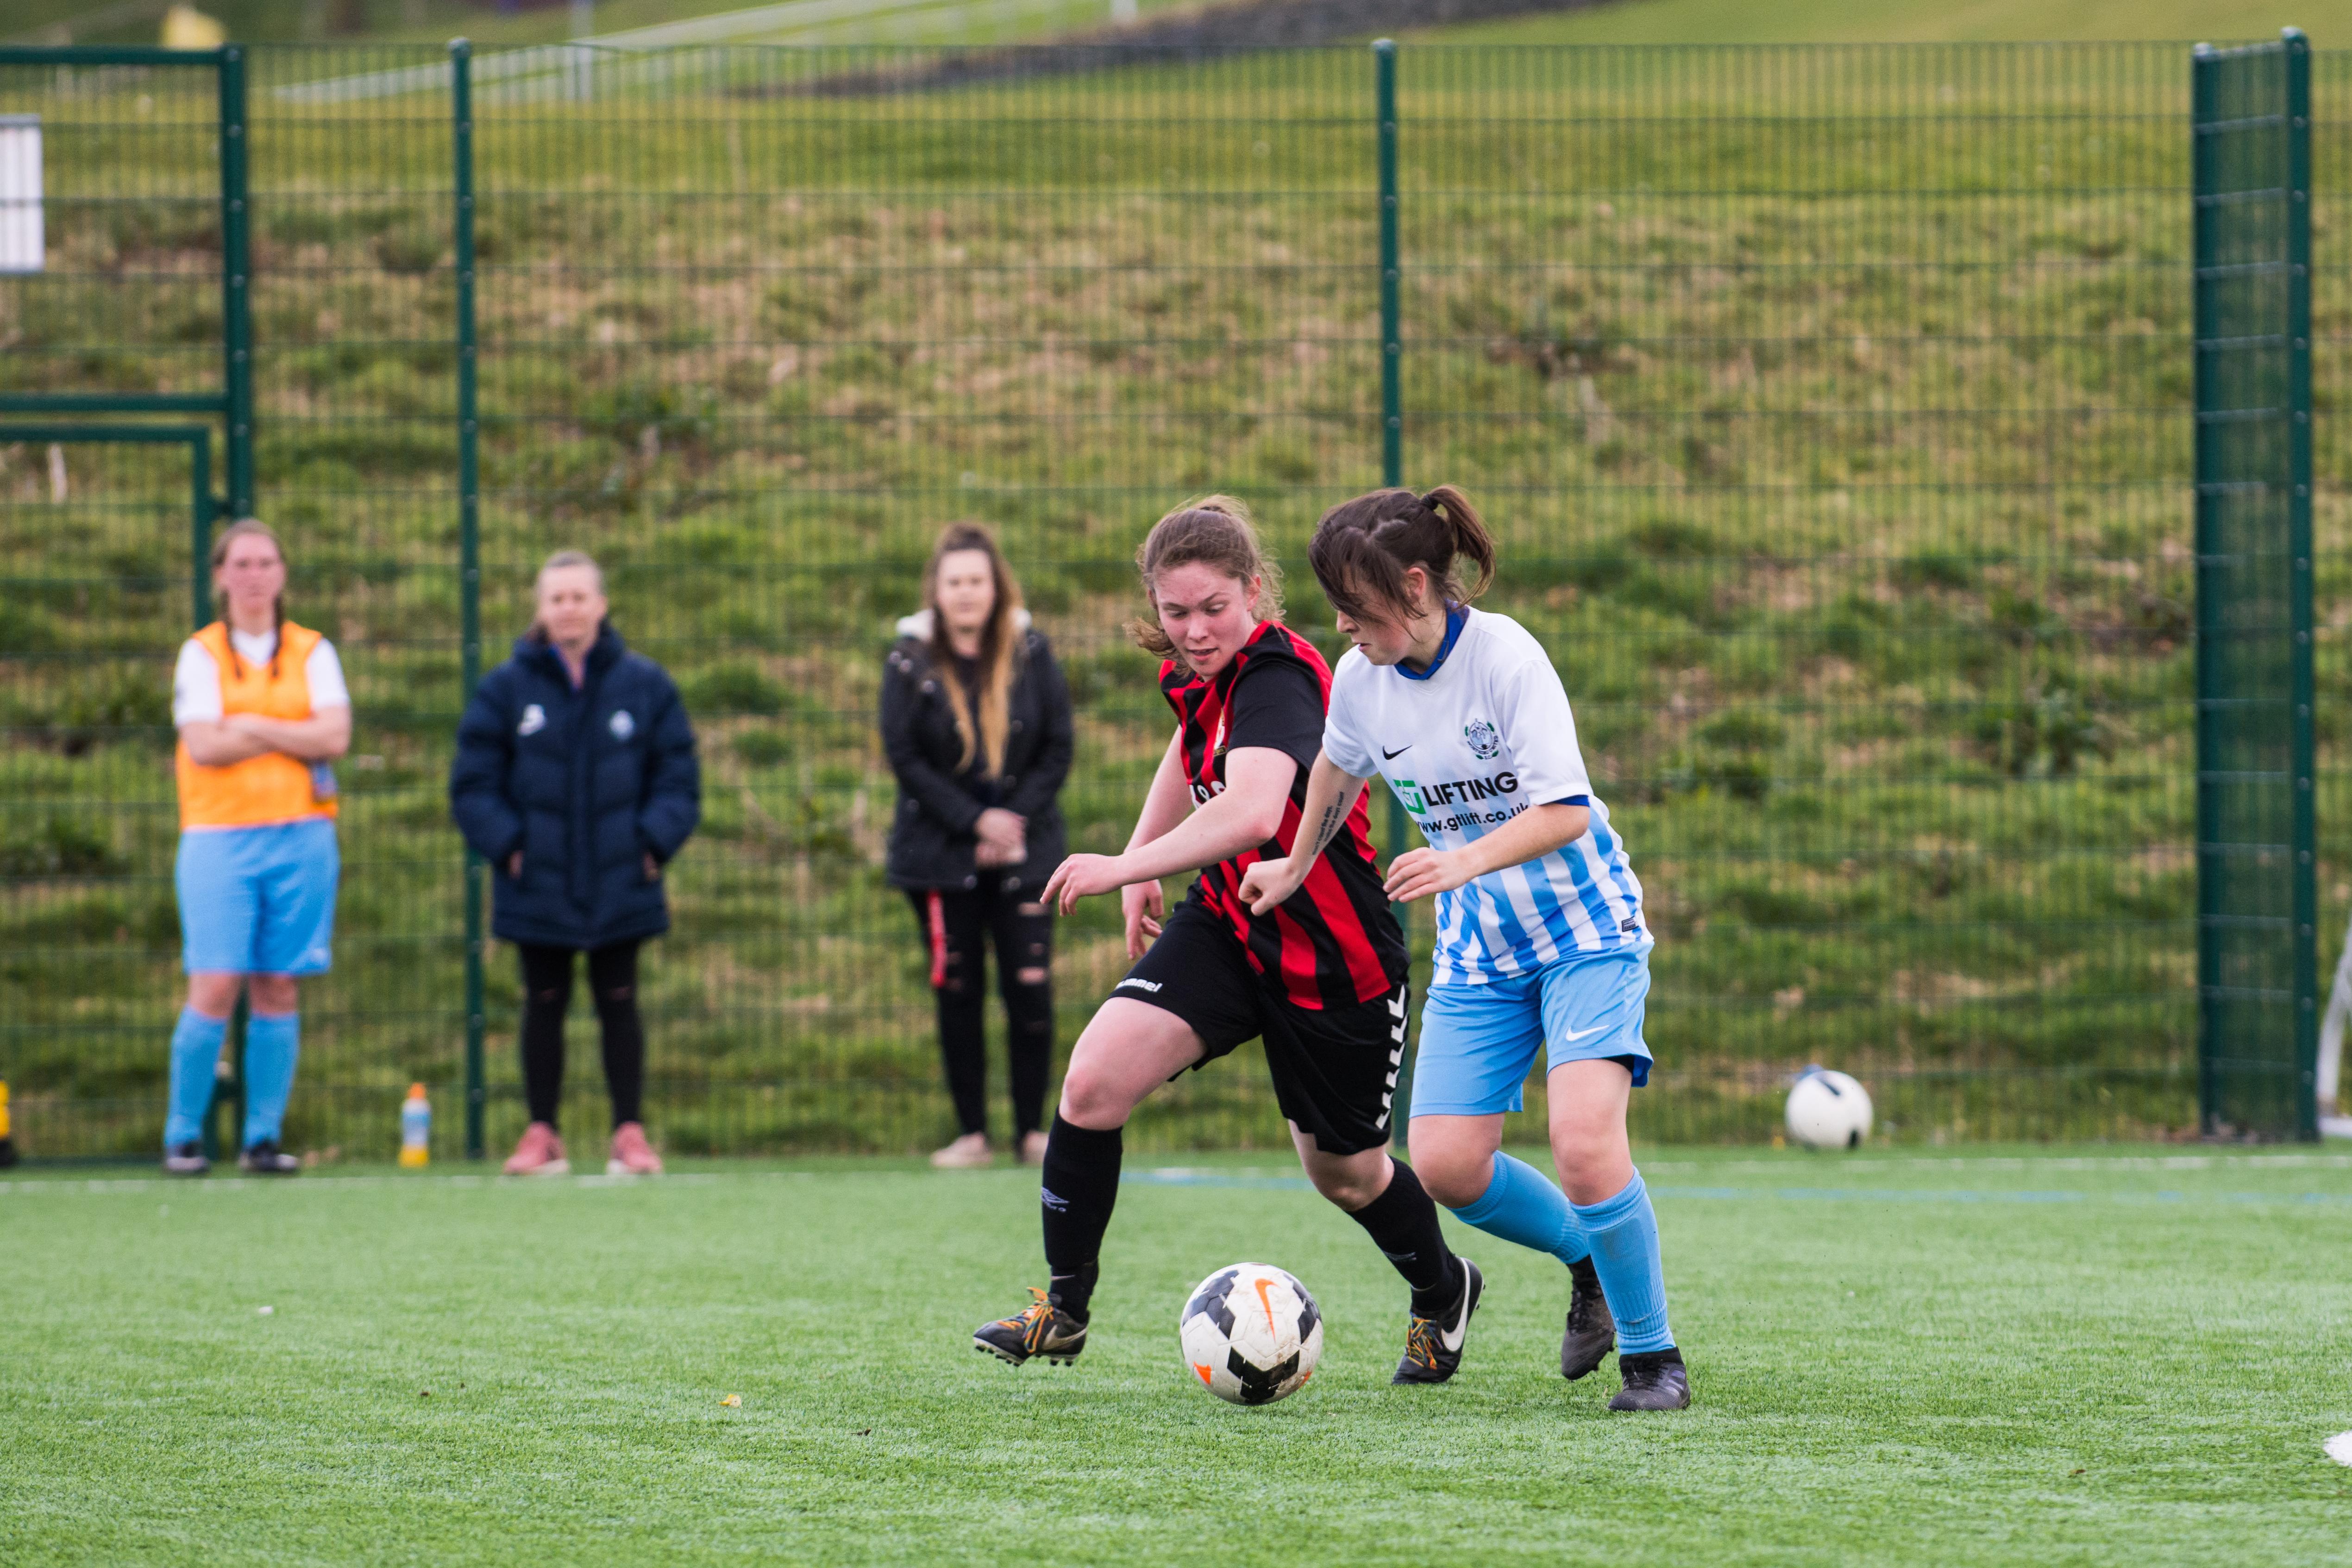 DAVID_JEFFERY Saltdean Utd Ladies FC vs Worthing Utd Ladies FC 11.03.18 36